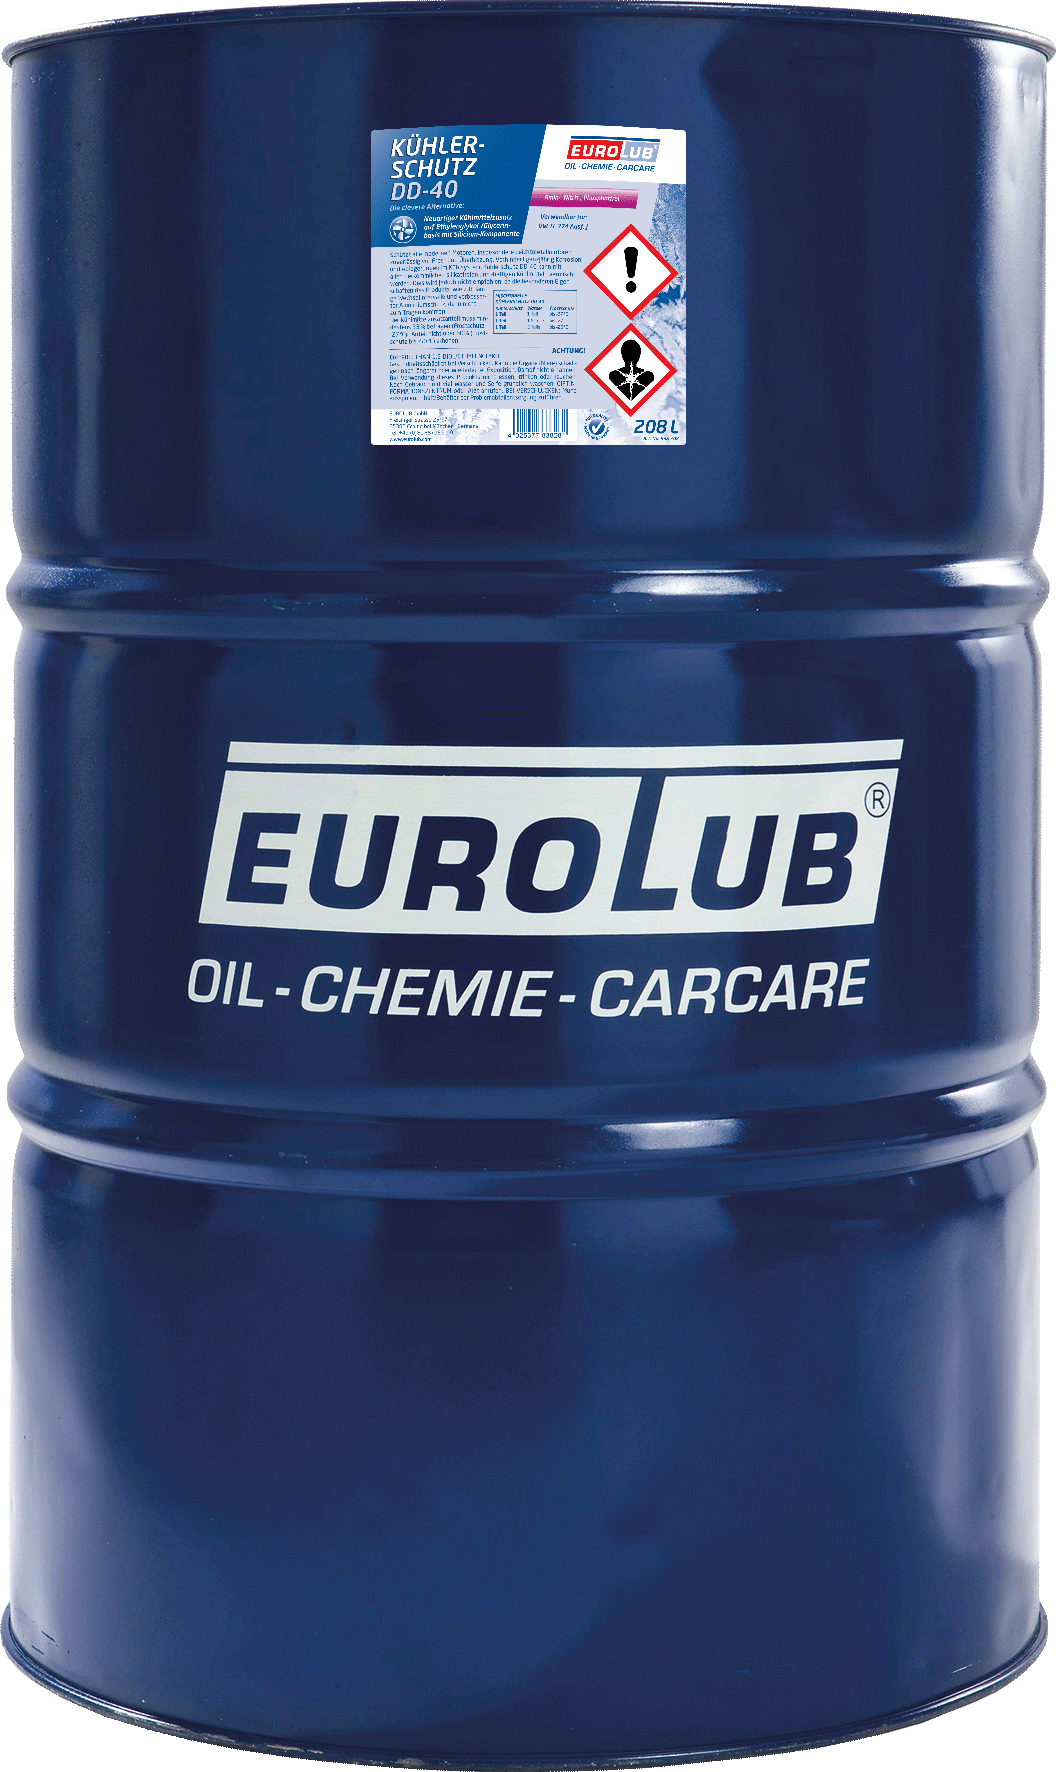 EUROLUB Kuhlerschutz  DD-40, 208л